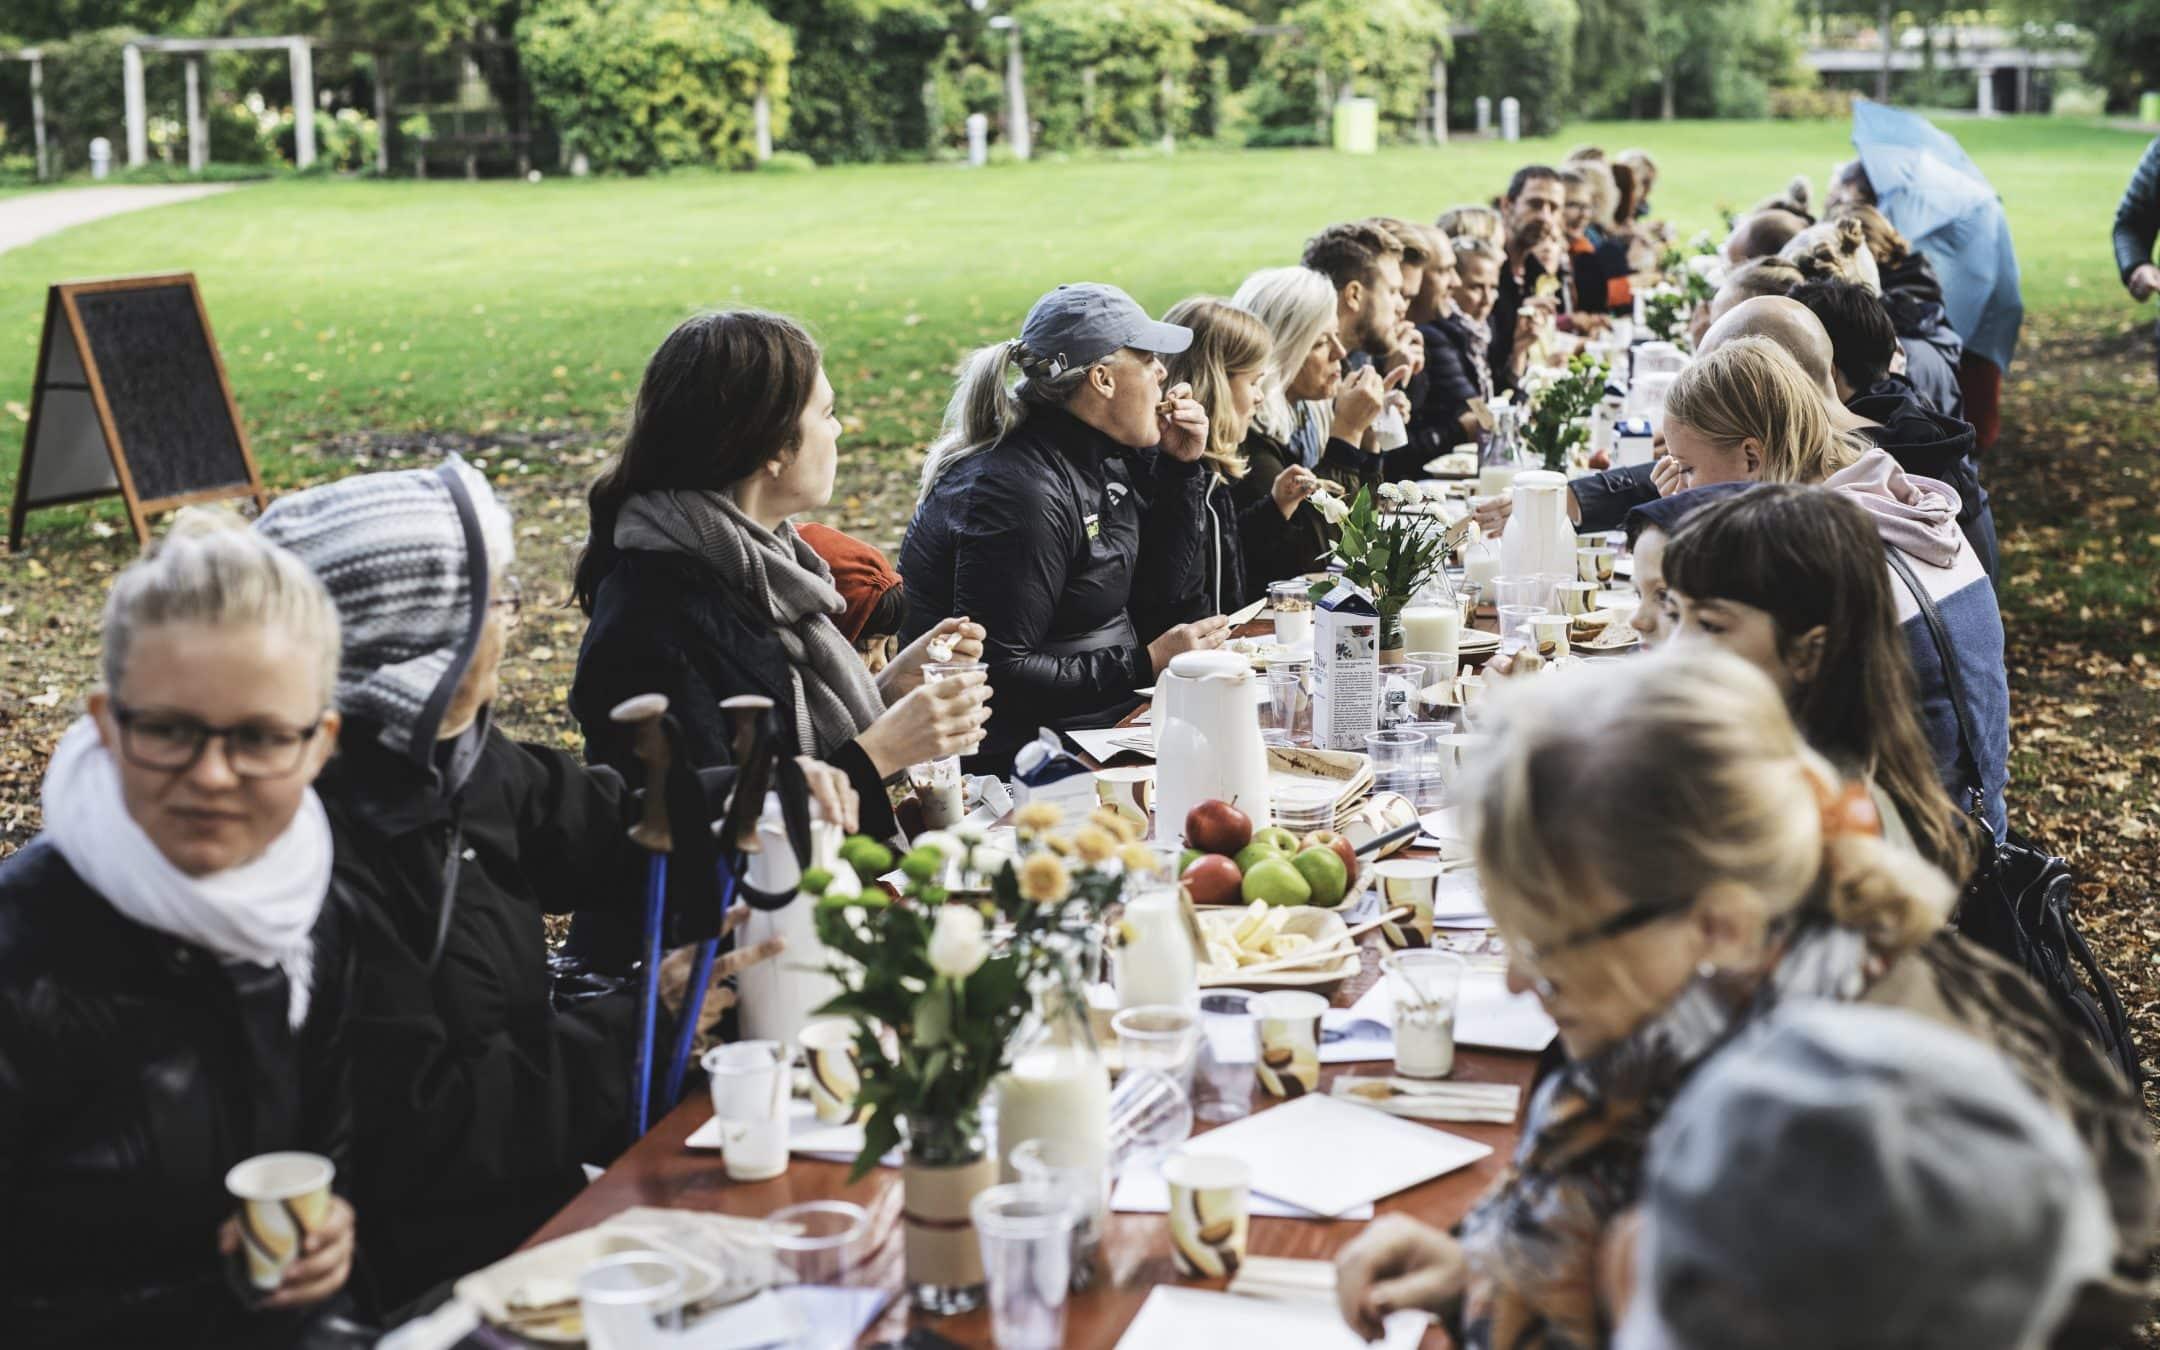 Årets osteprogram på SPIS! Odense Food Festival